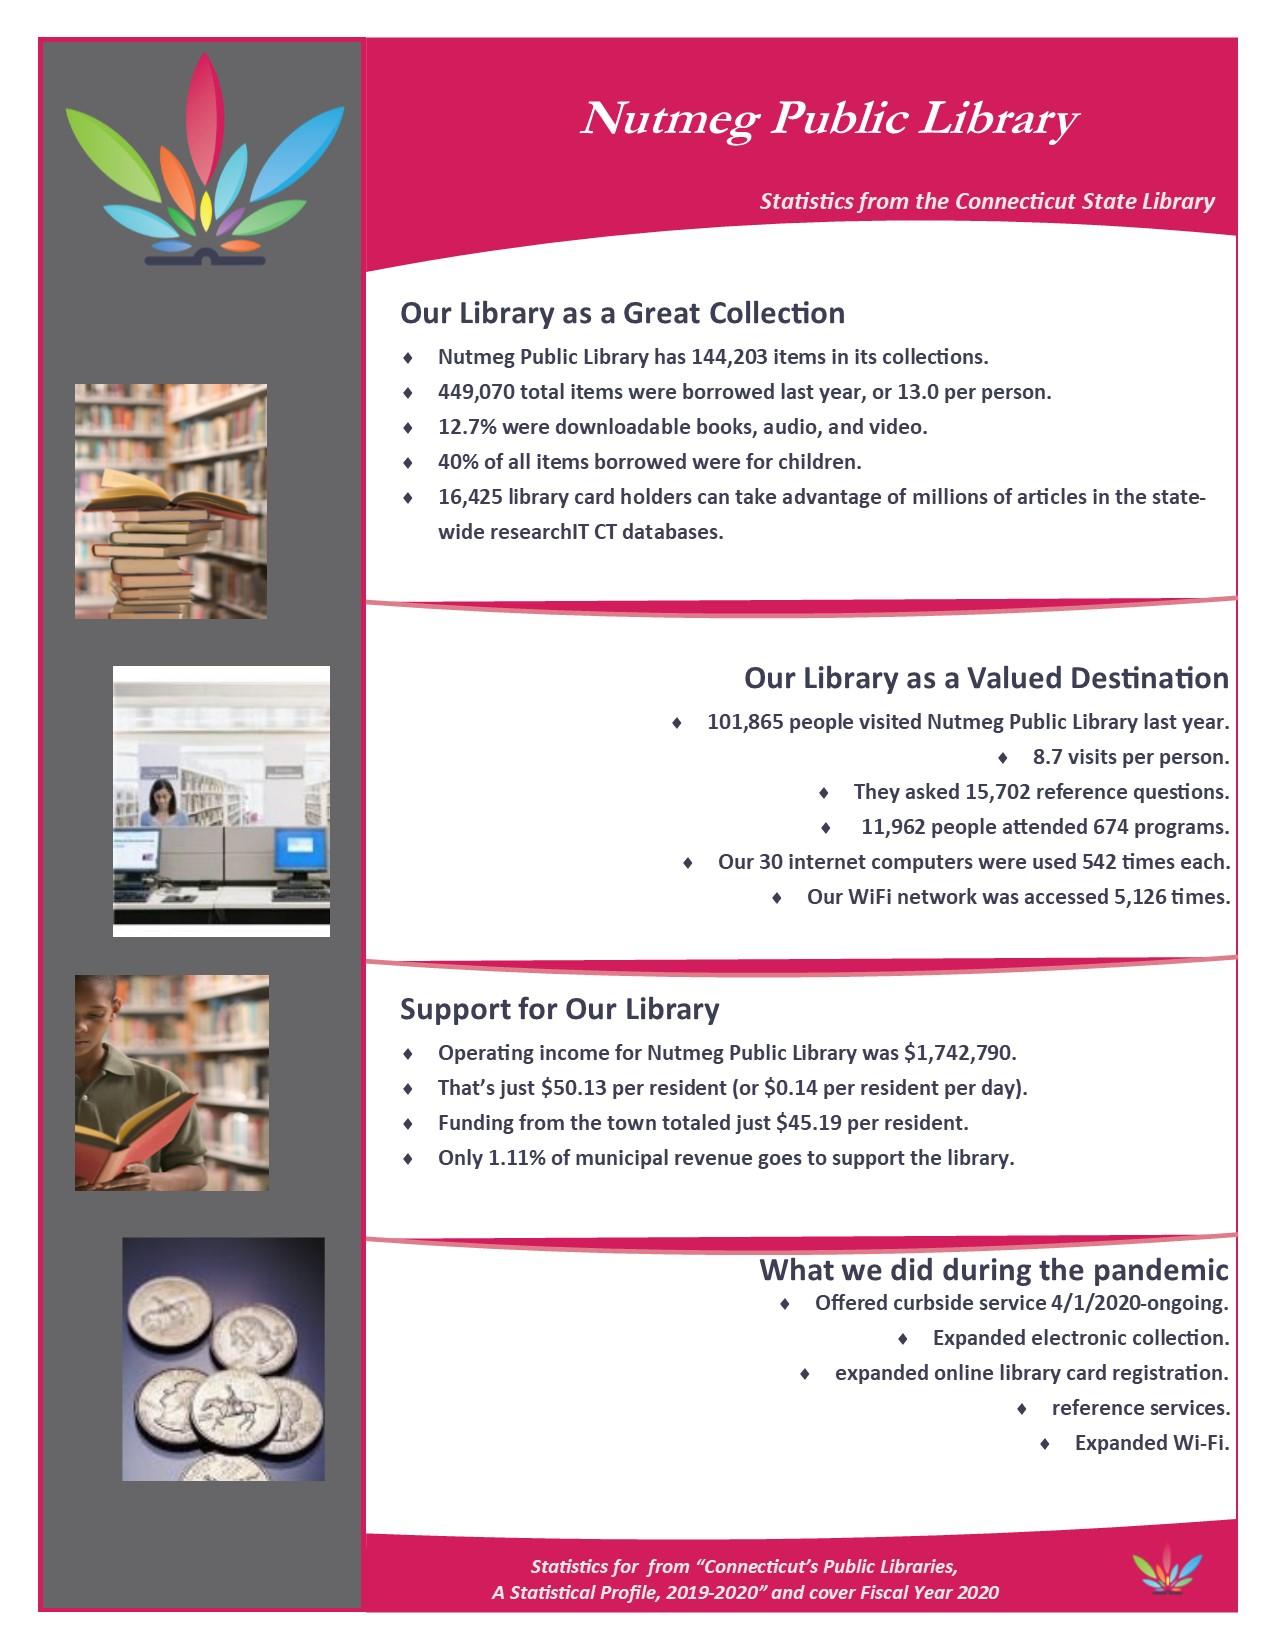 Nutmeg Public Library Flyer